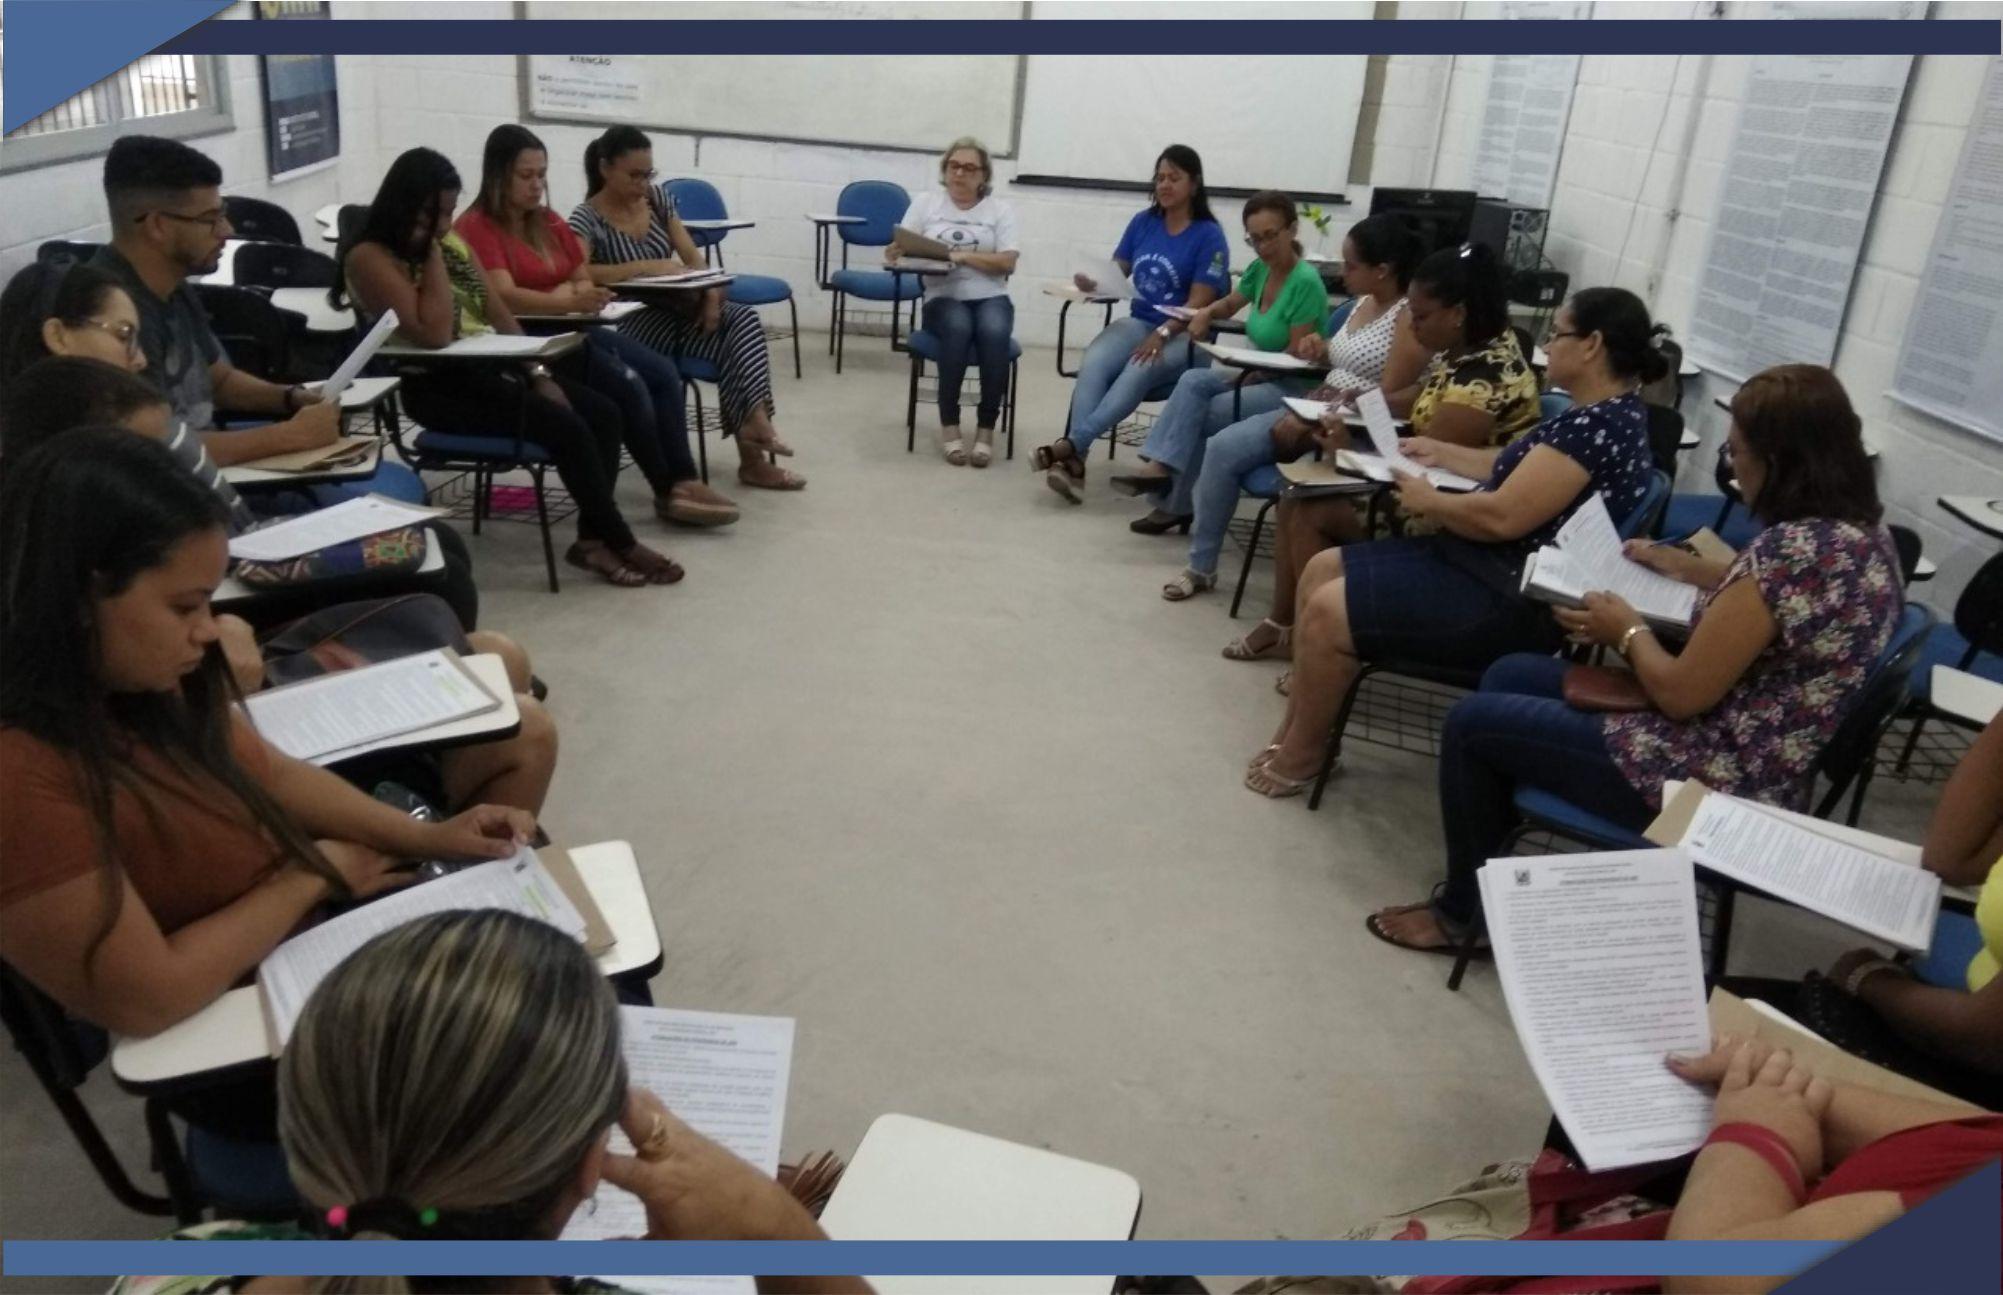 PREFEITURA ORIENTA SOBRE ATENDIMENTO EDUCACIONAL ESPECIALIZADO